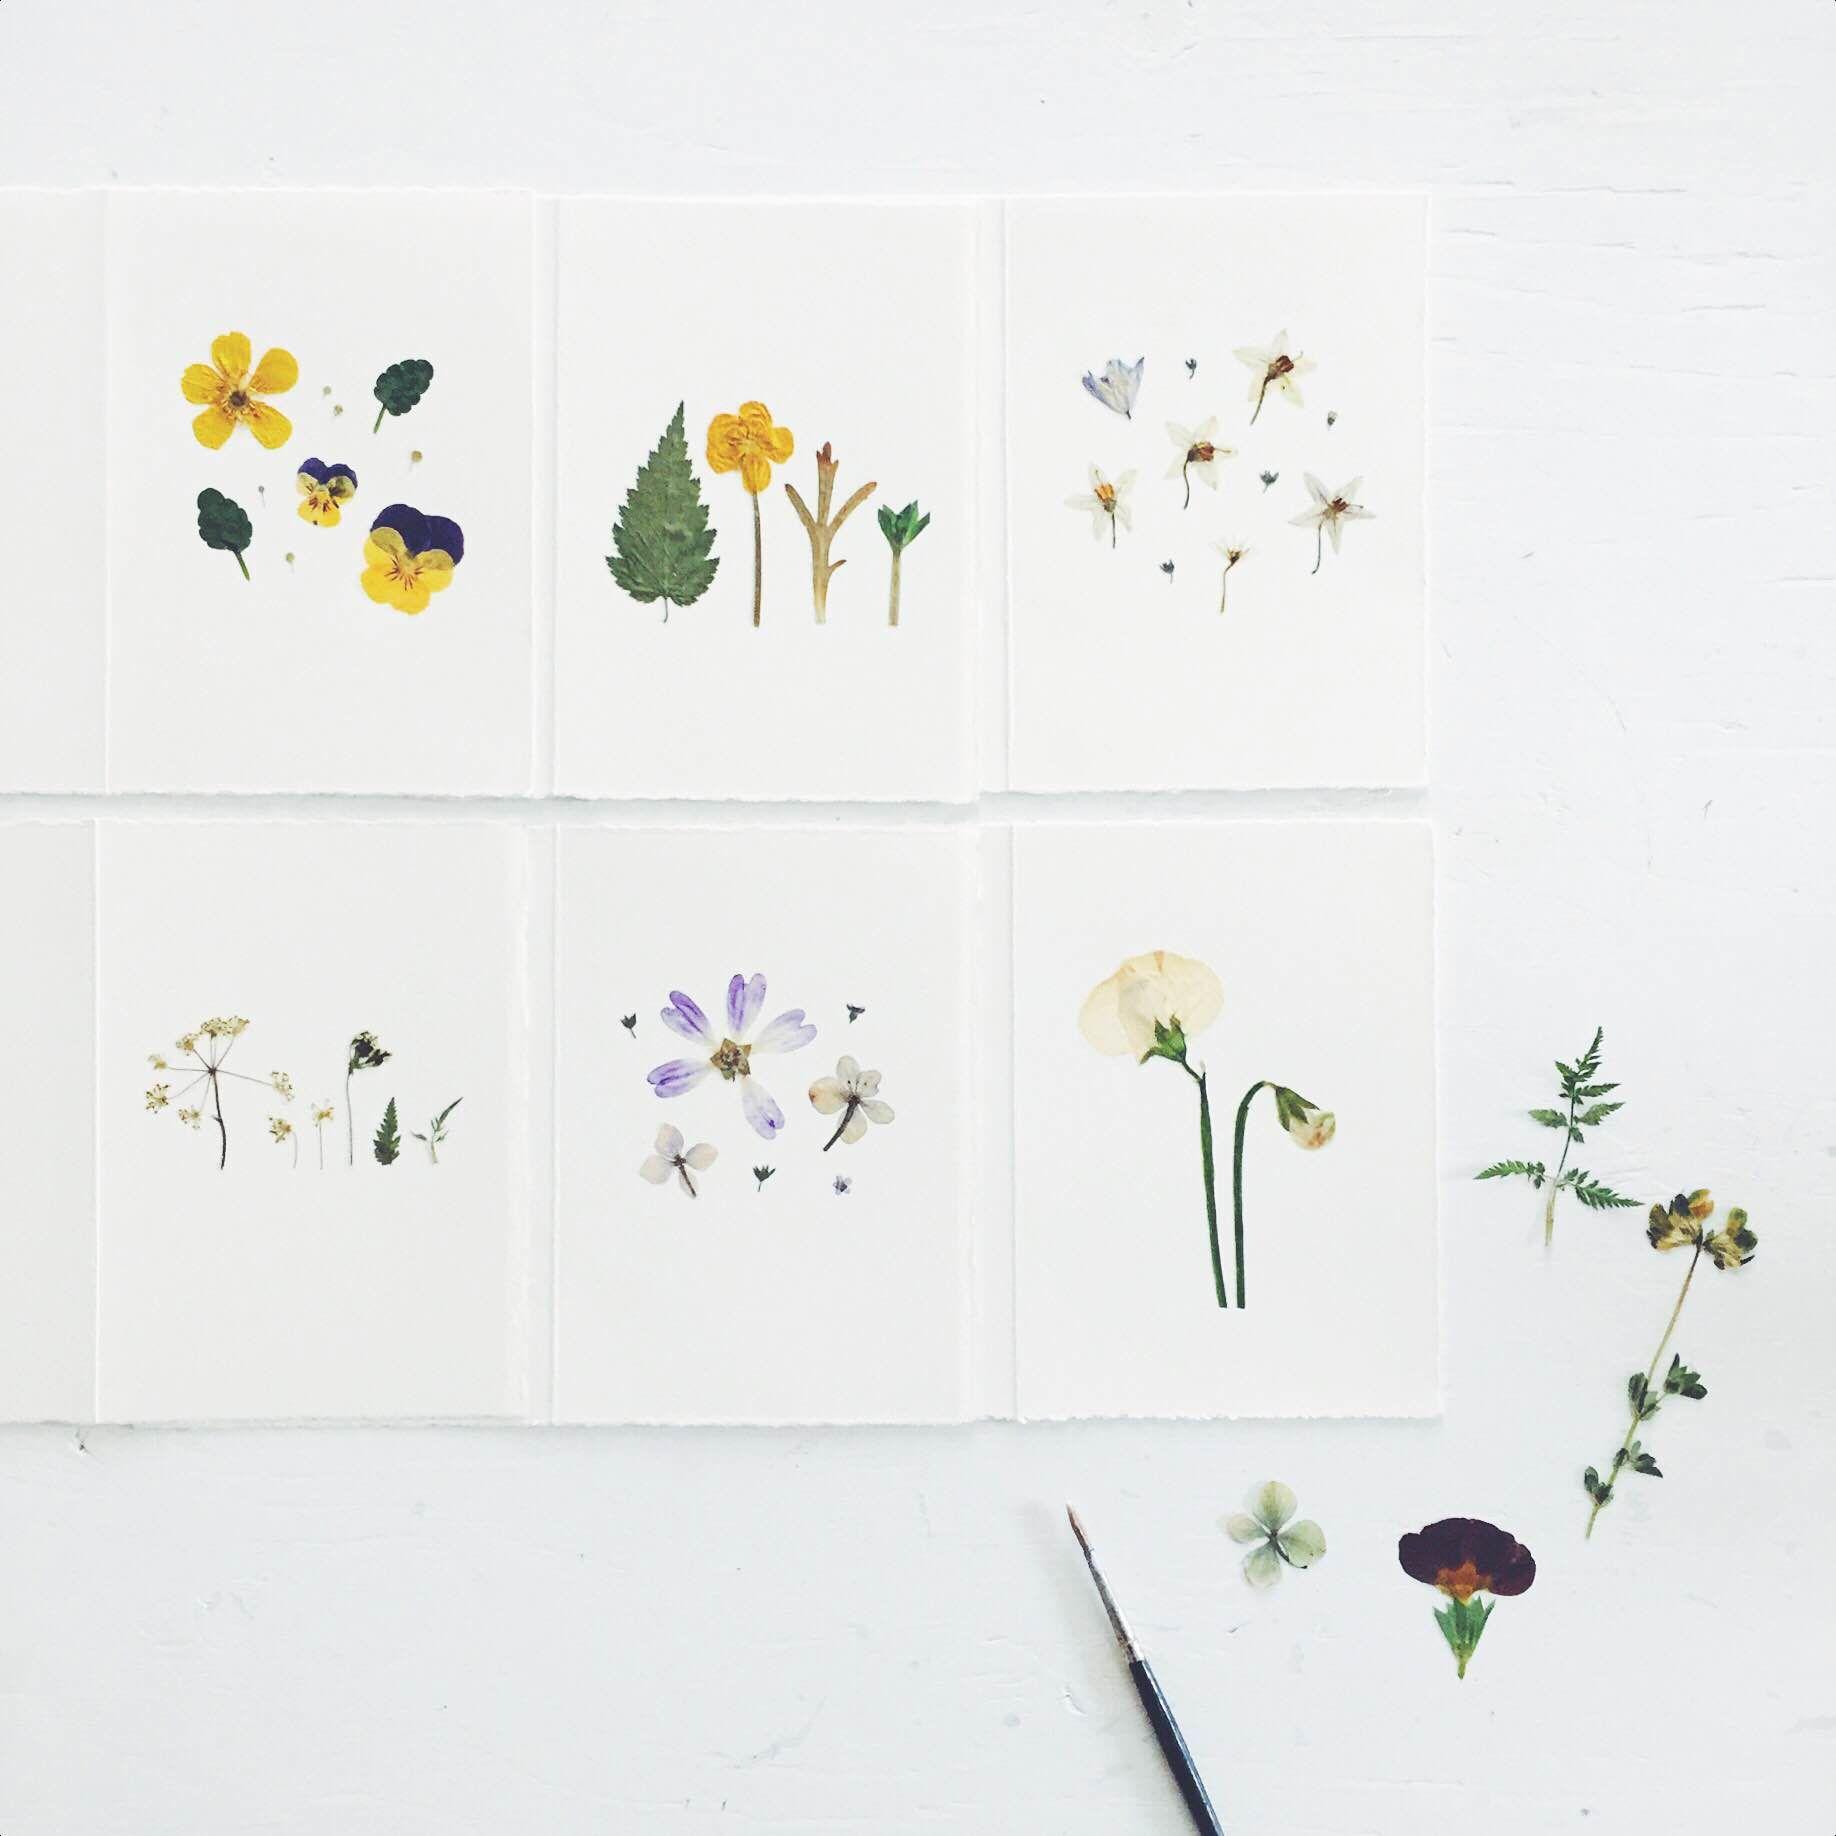 Pressed flower artworks from mr studio london flower artwork pressed flower artworks from mr studio london mightylinksfo